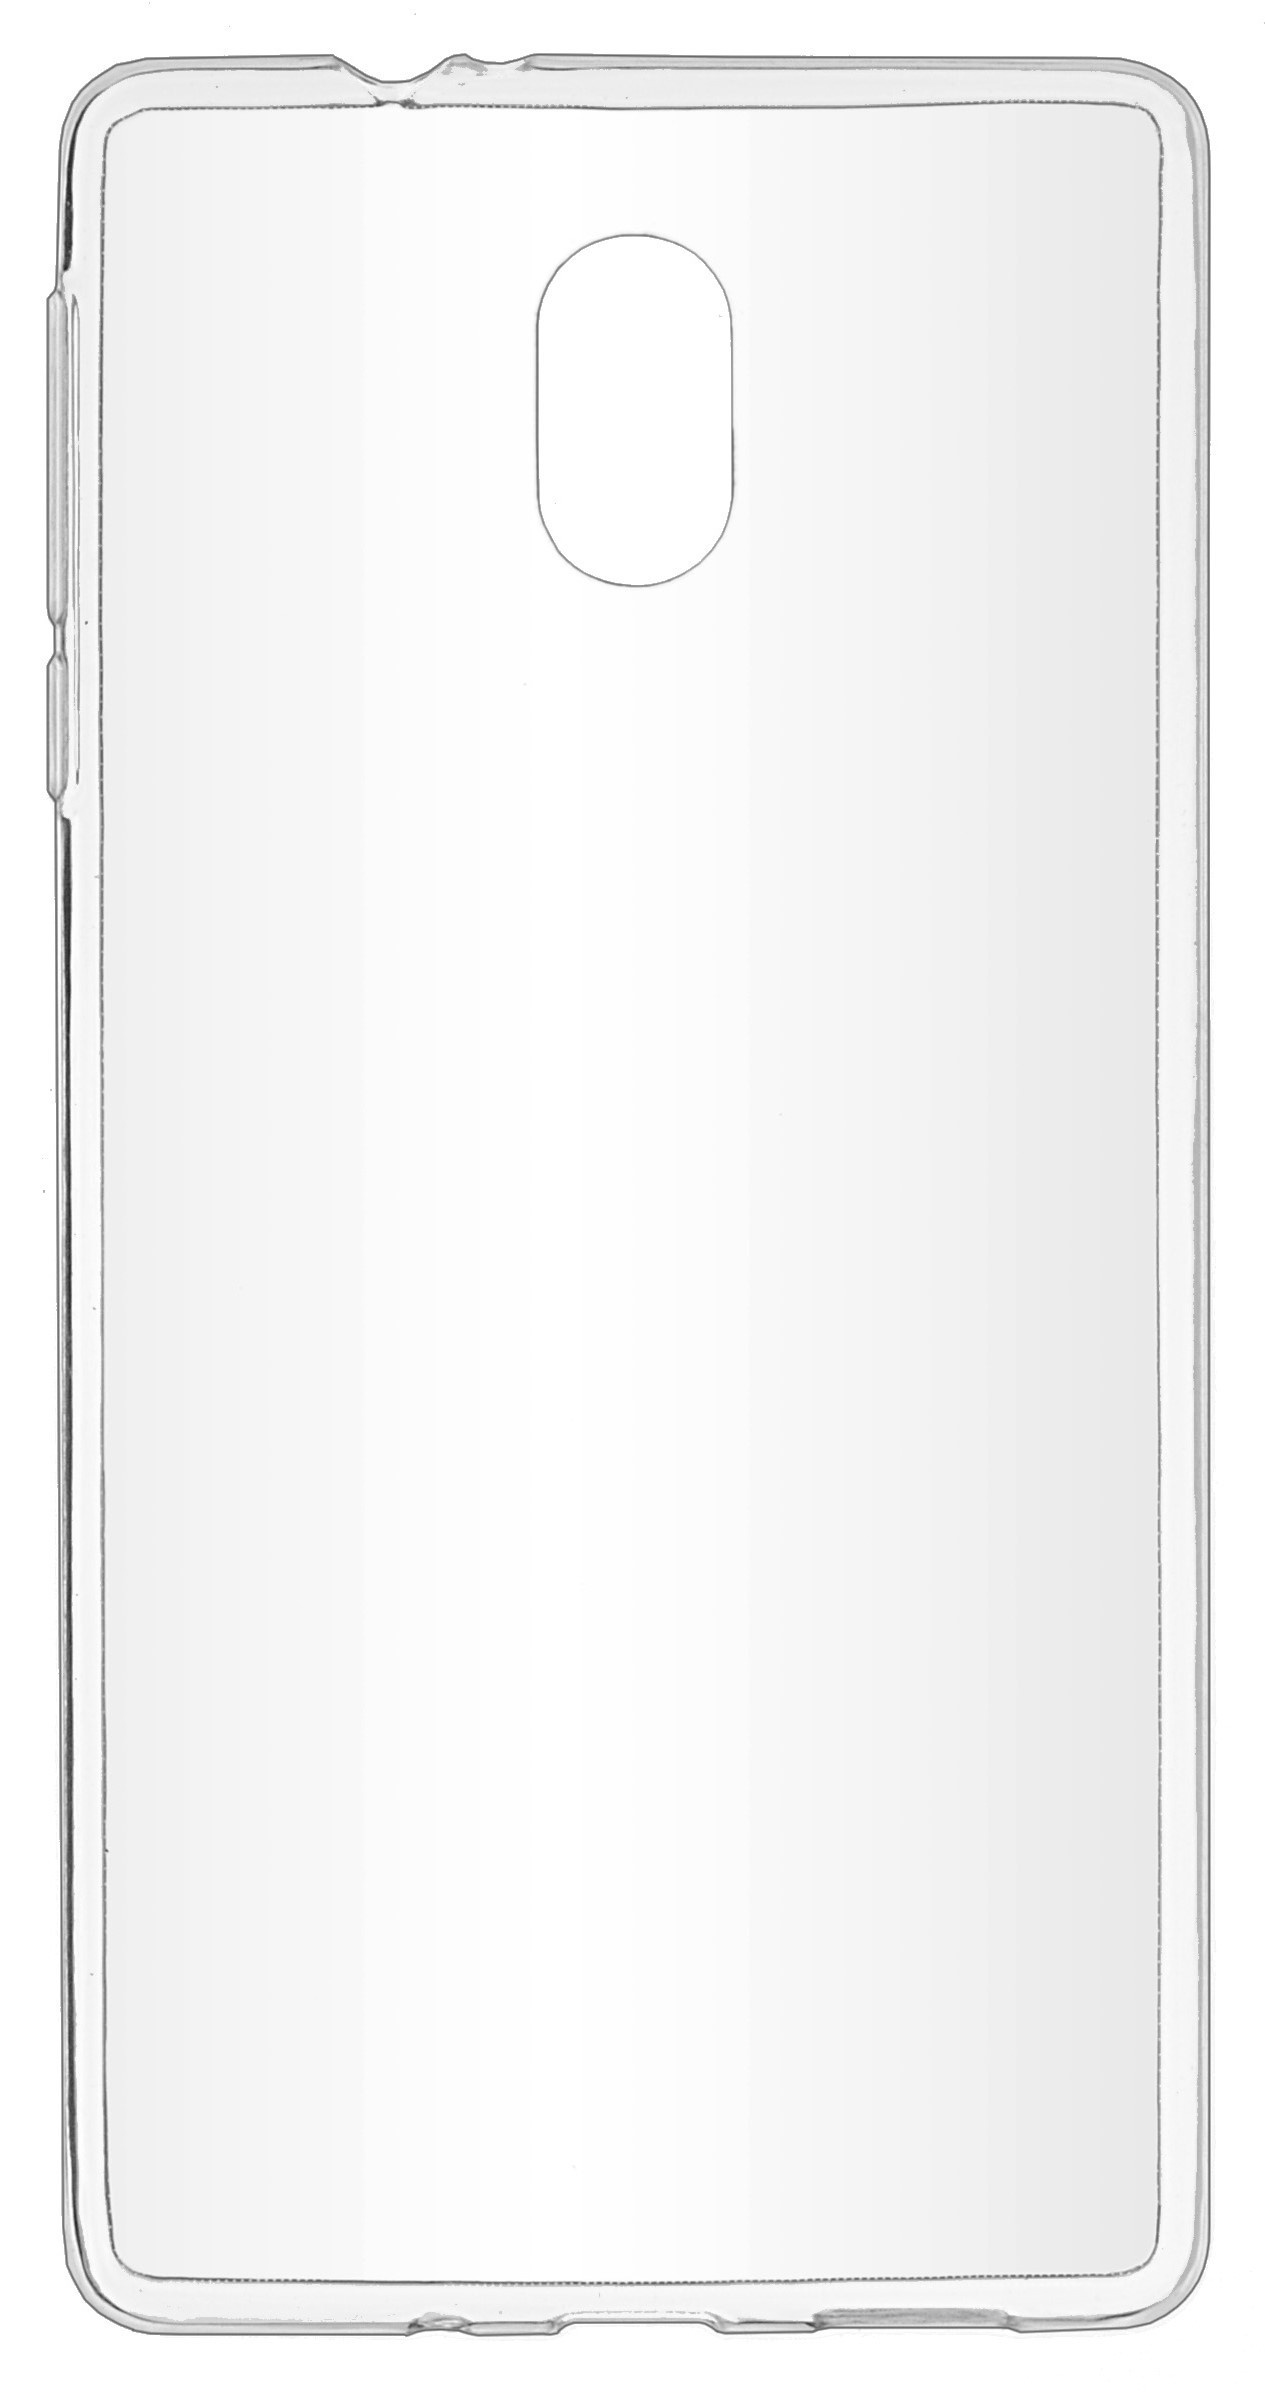 Чехол для сотового телефона skinBOX Slim Silicone, 4630042529656, прозрачный цены онлайн